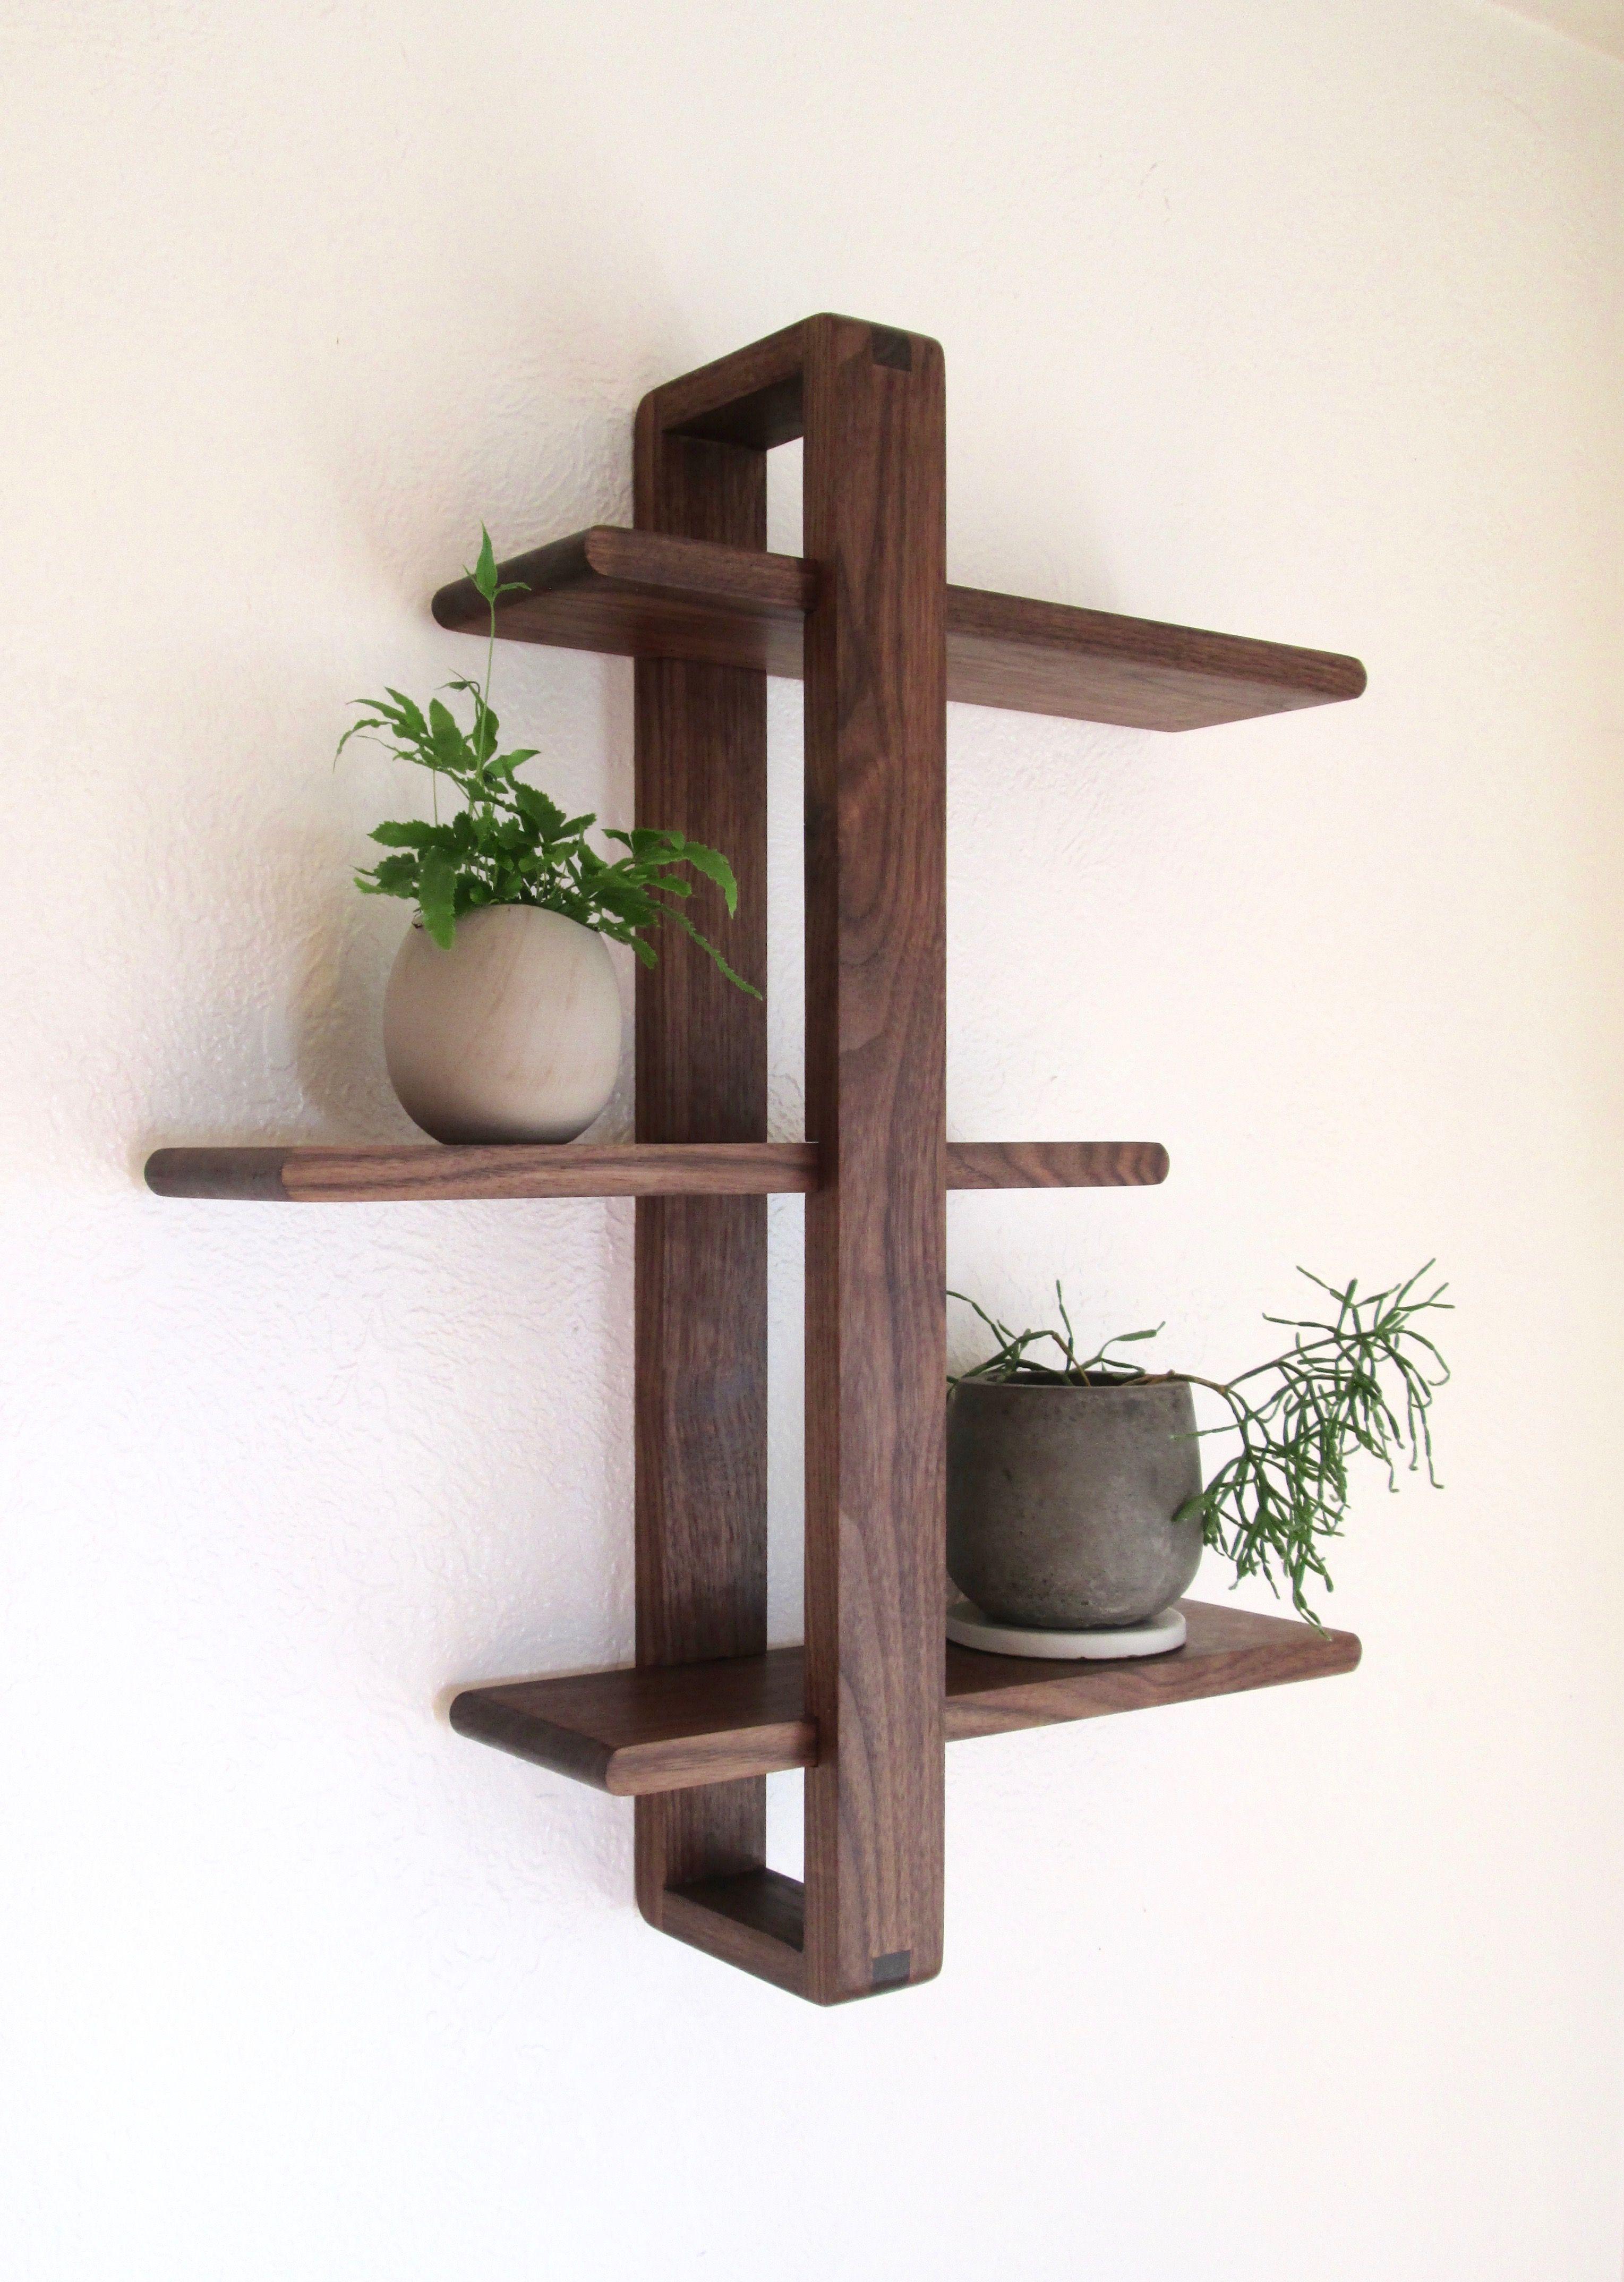 Shift Shelf Modern Wall Shelf Solid Walnut For Hanging Plants